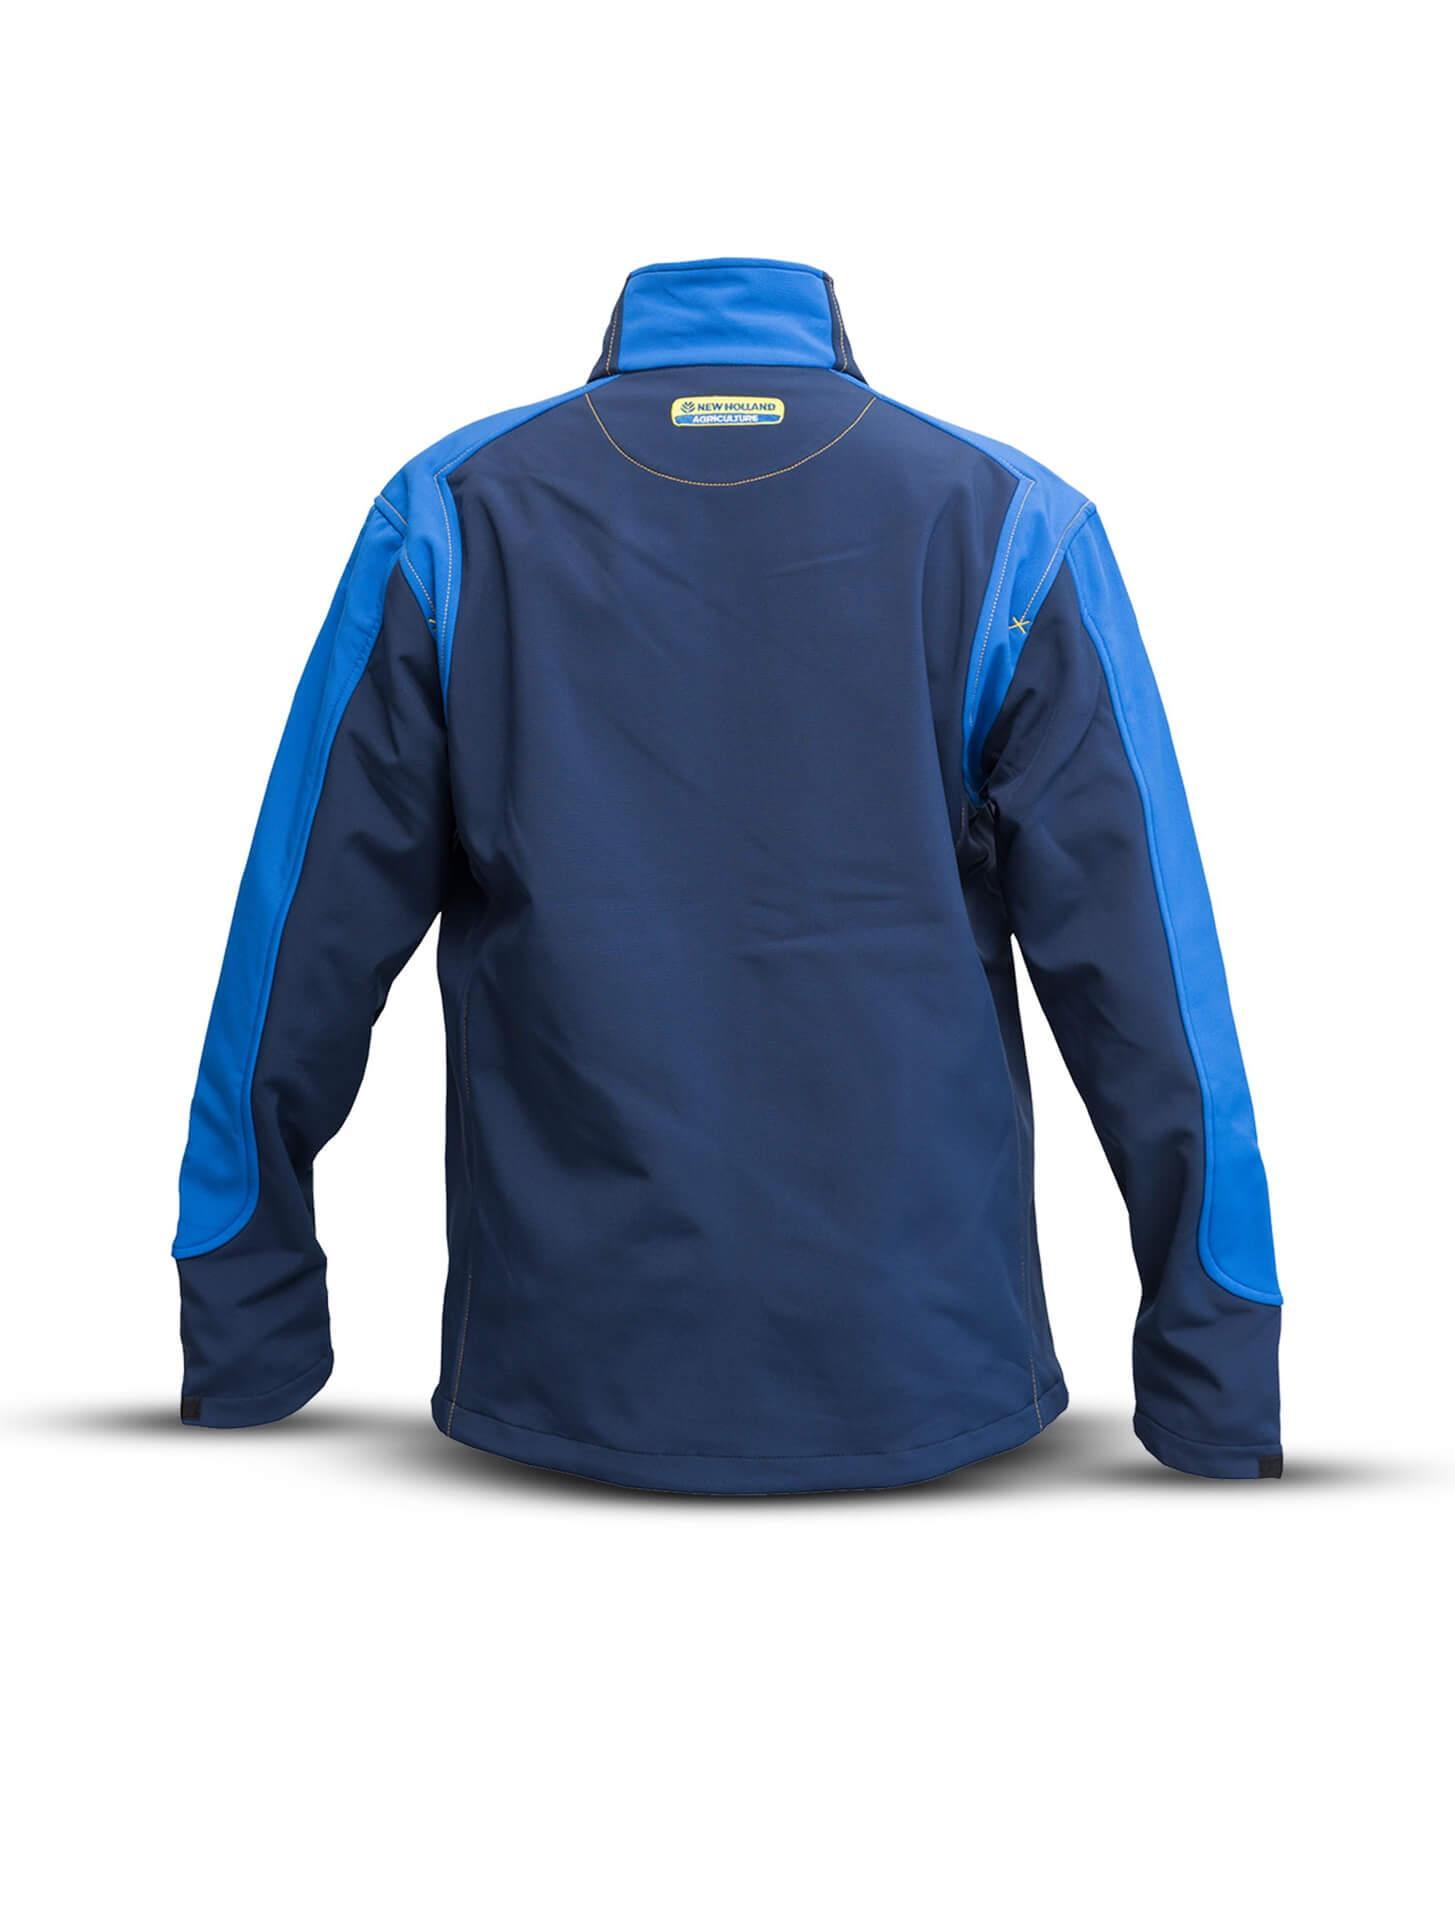 0002676 softshell jacket